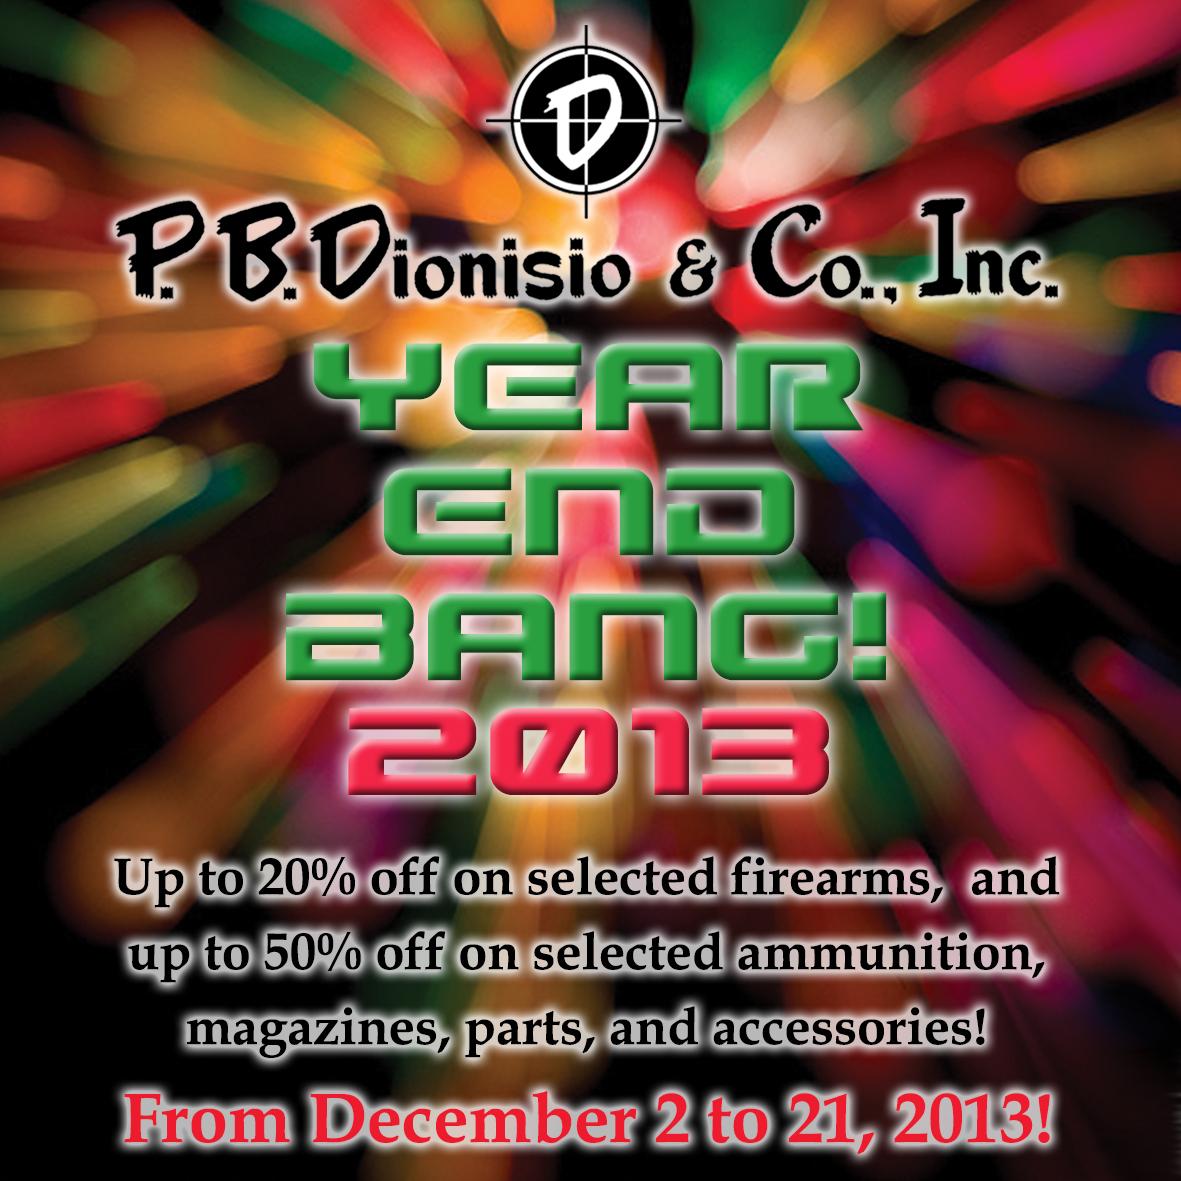 Manila, Philippines. P.B.Dionisio Gun Store's Year End Bang Sale 2013